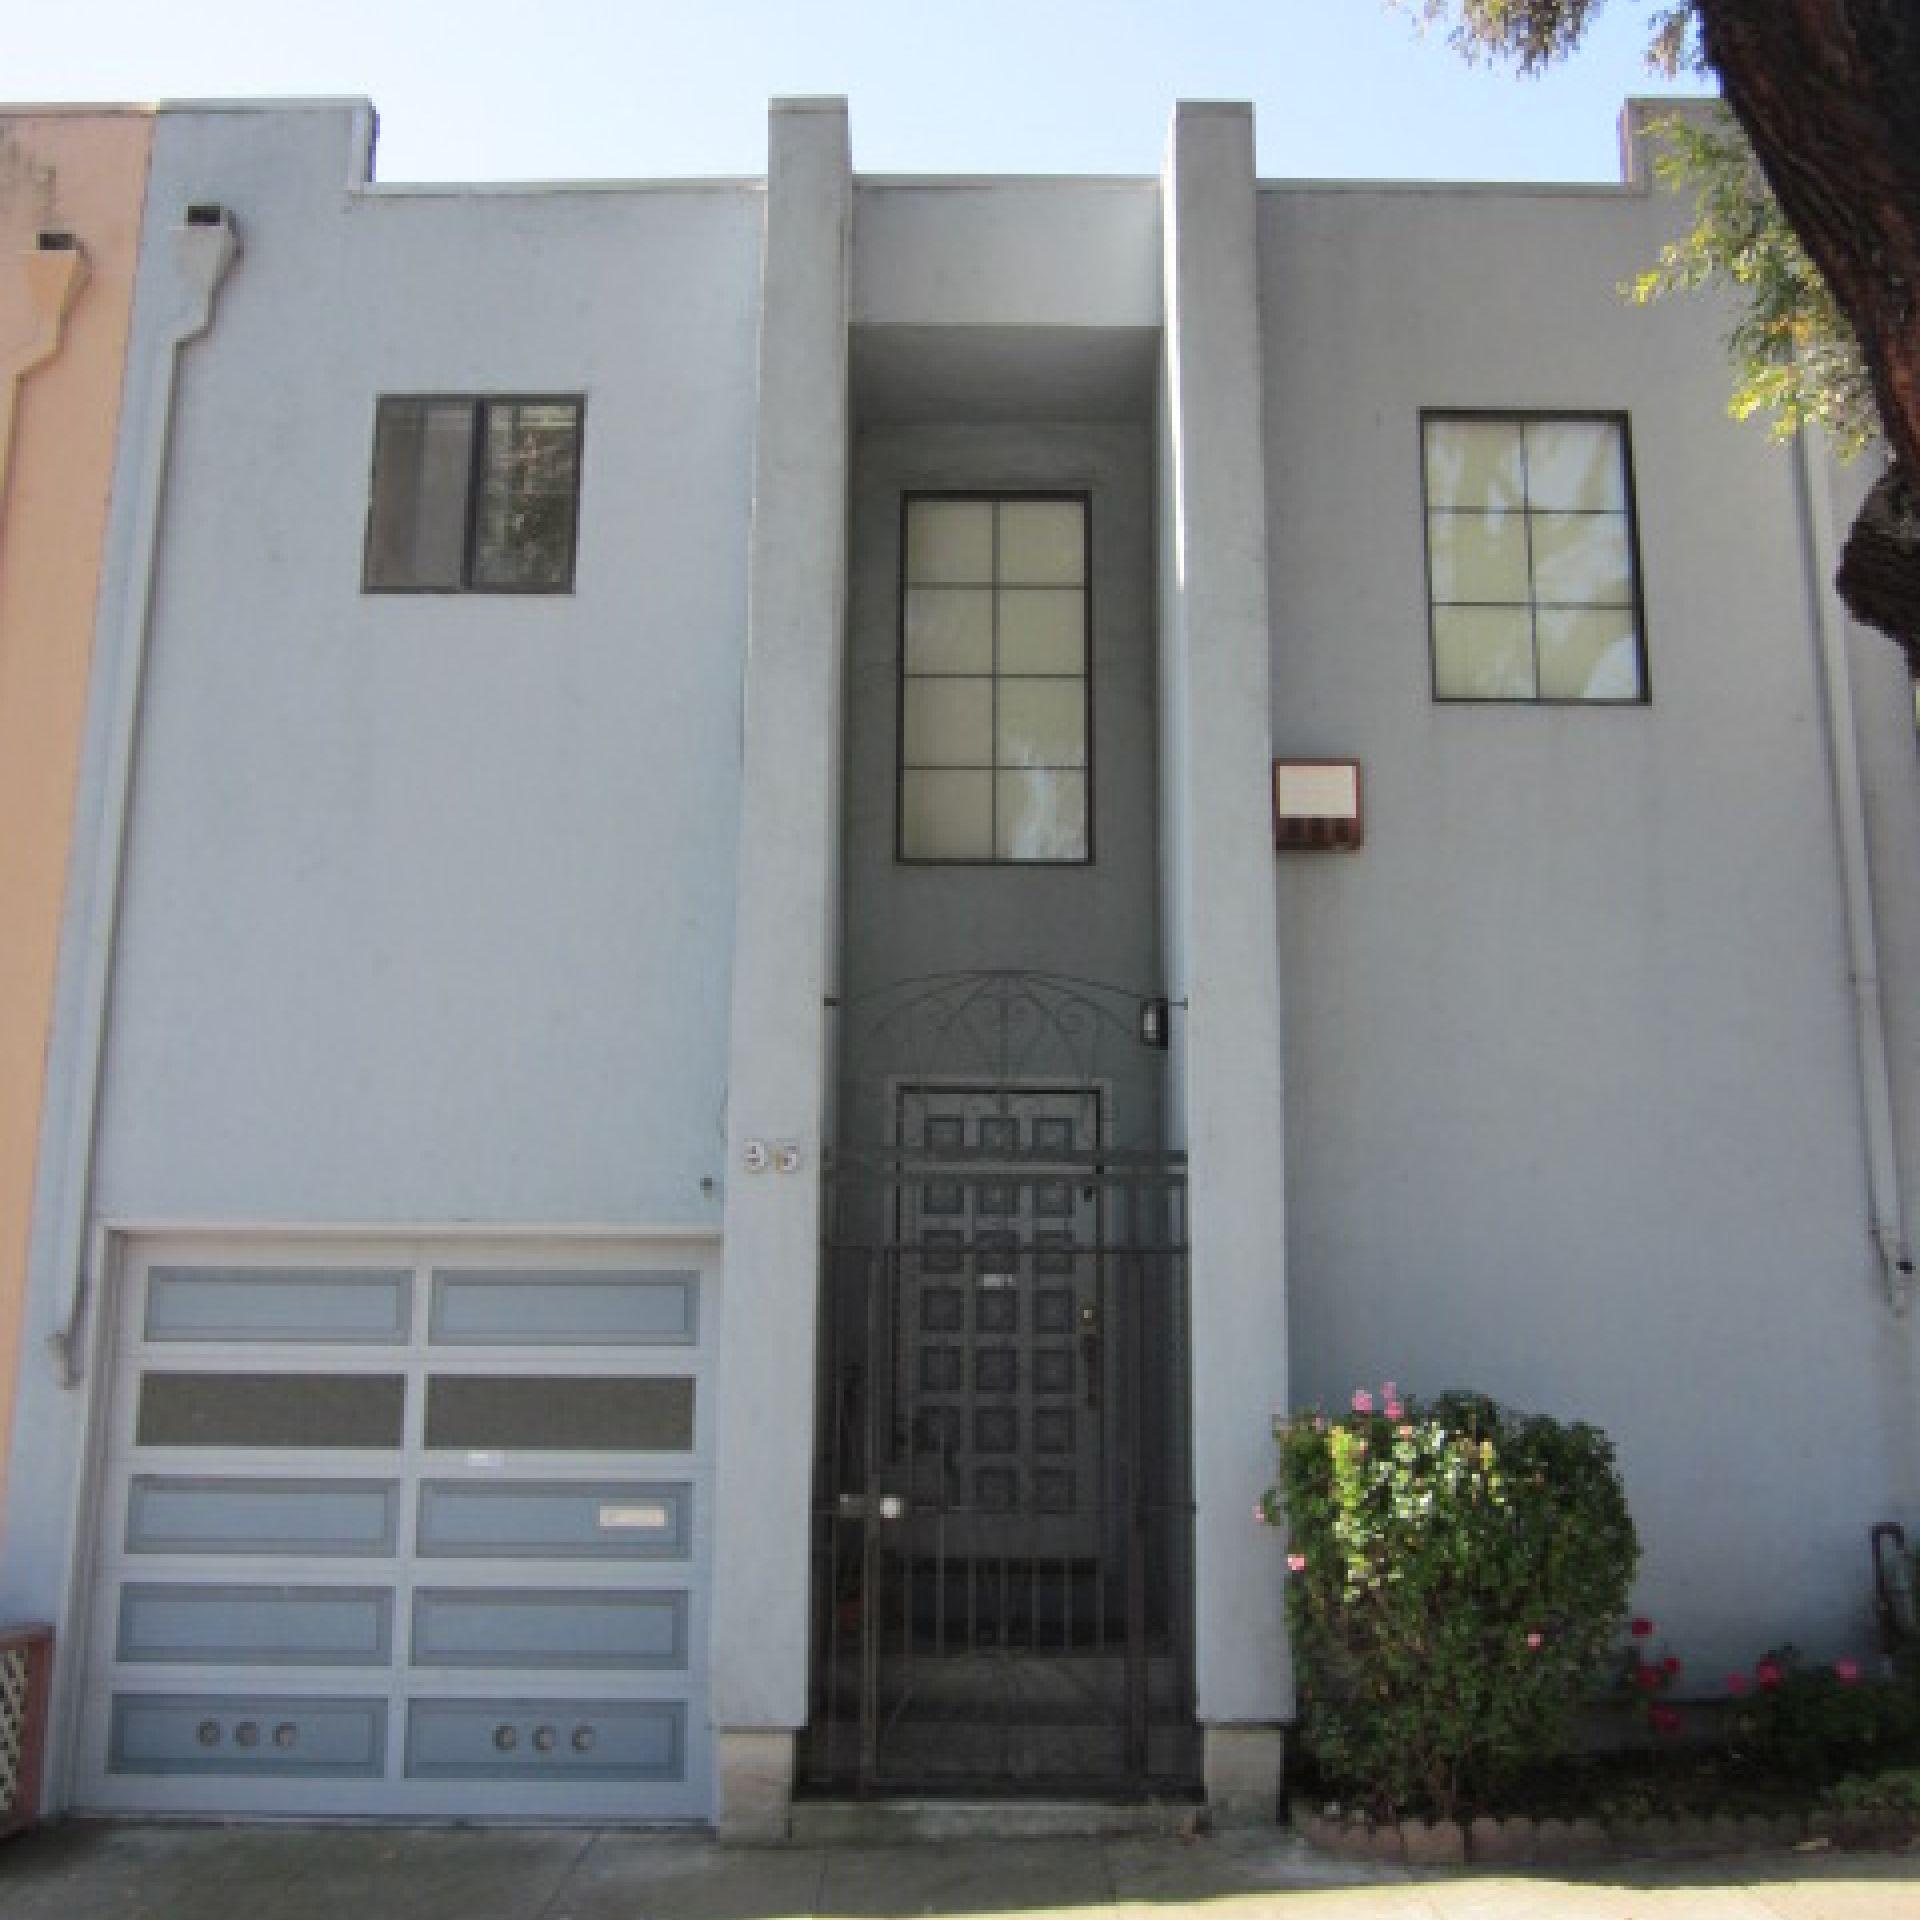 2BR/2BA house in Sunnyside